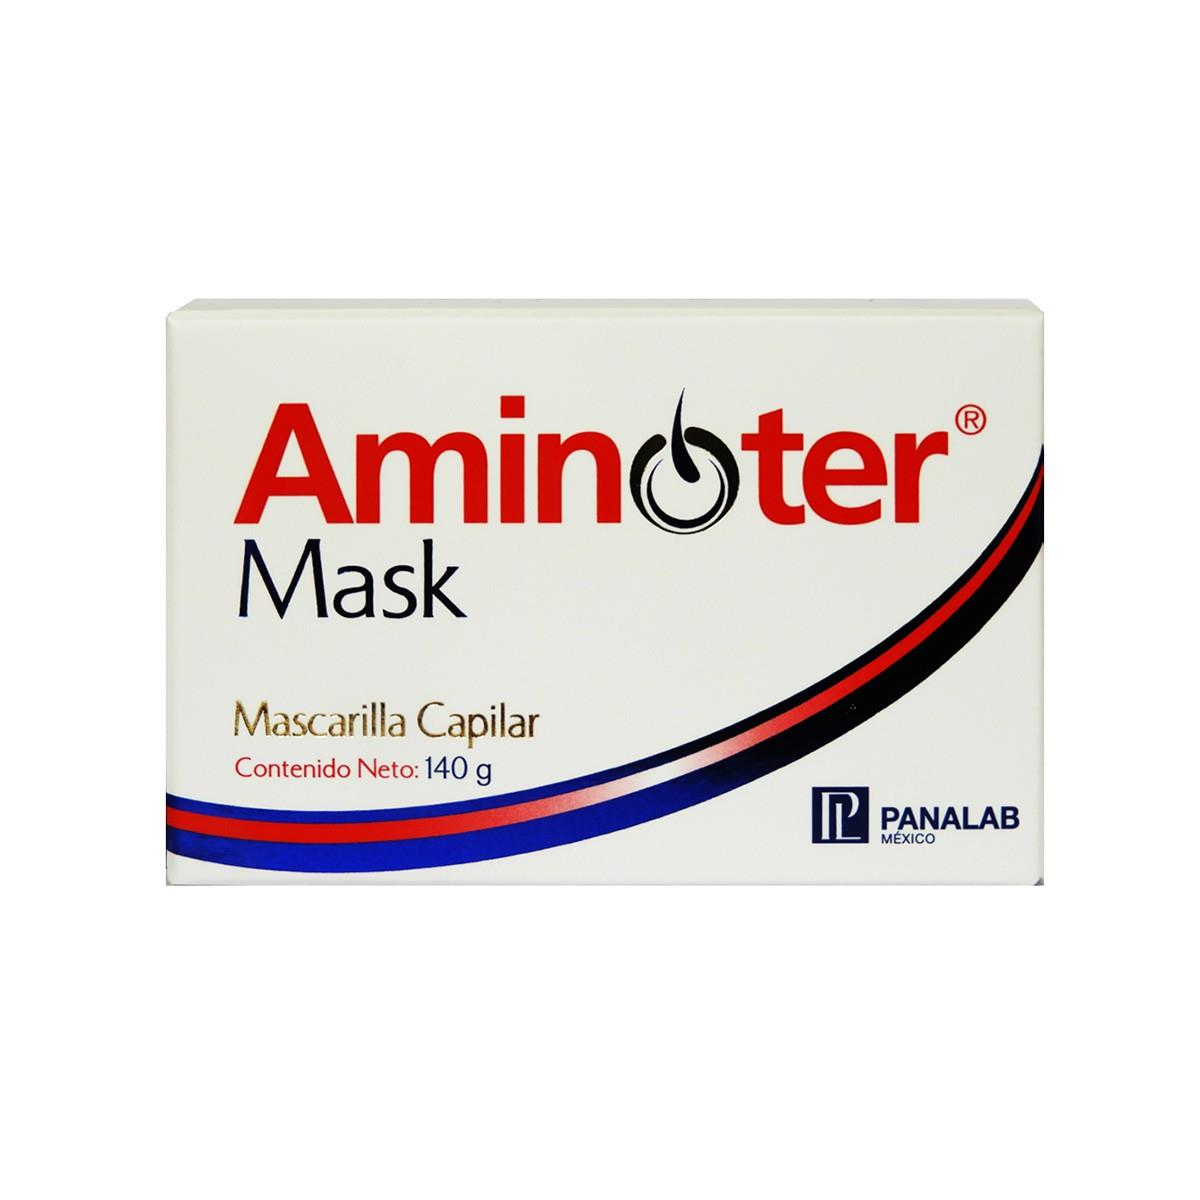 Aminoter Mask, Mascarilla Capilar, Tarro Con 140G